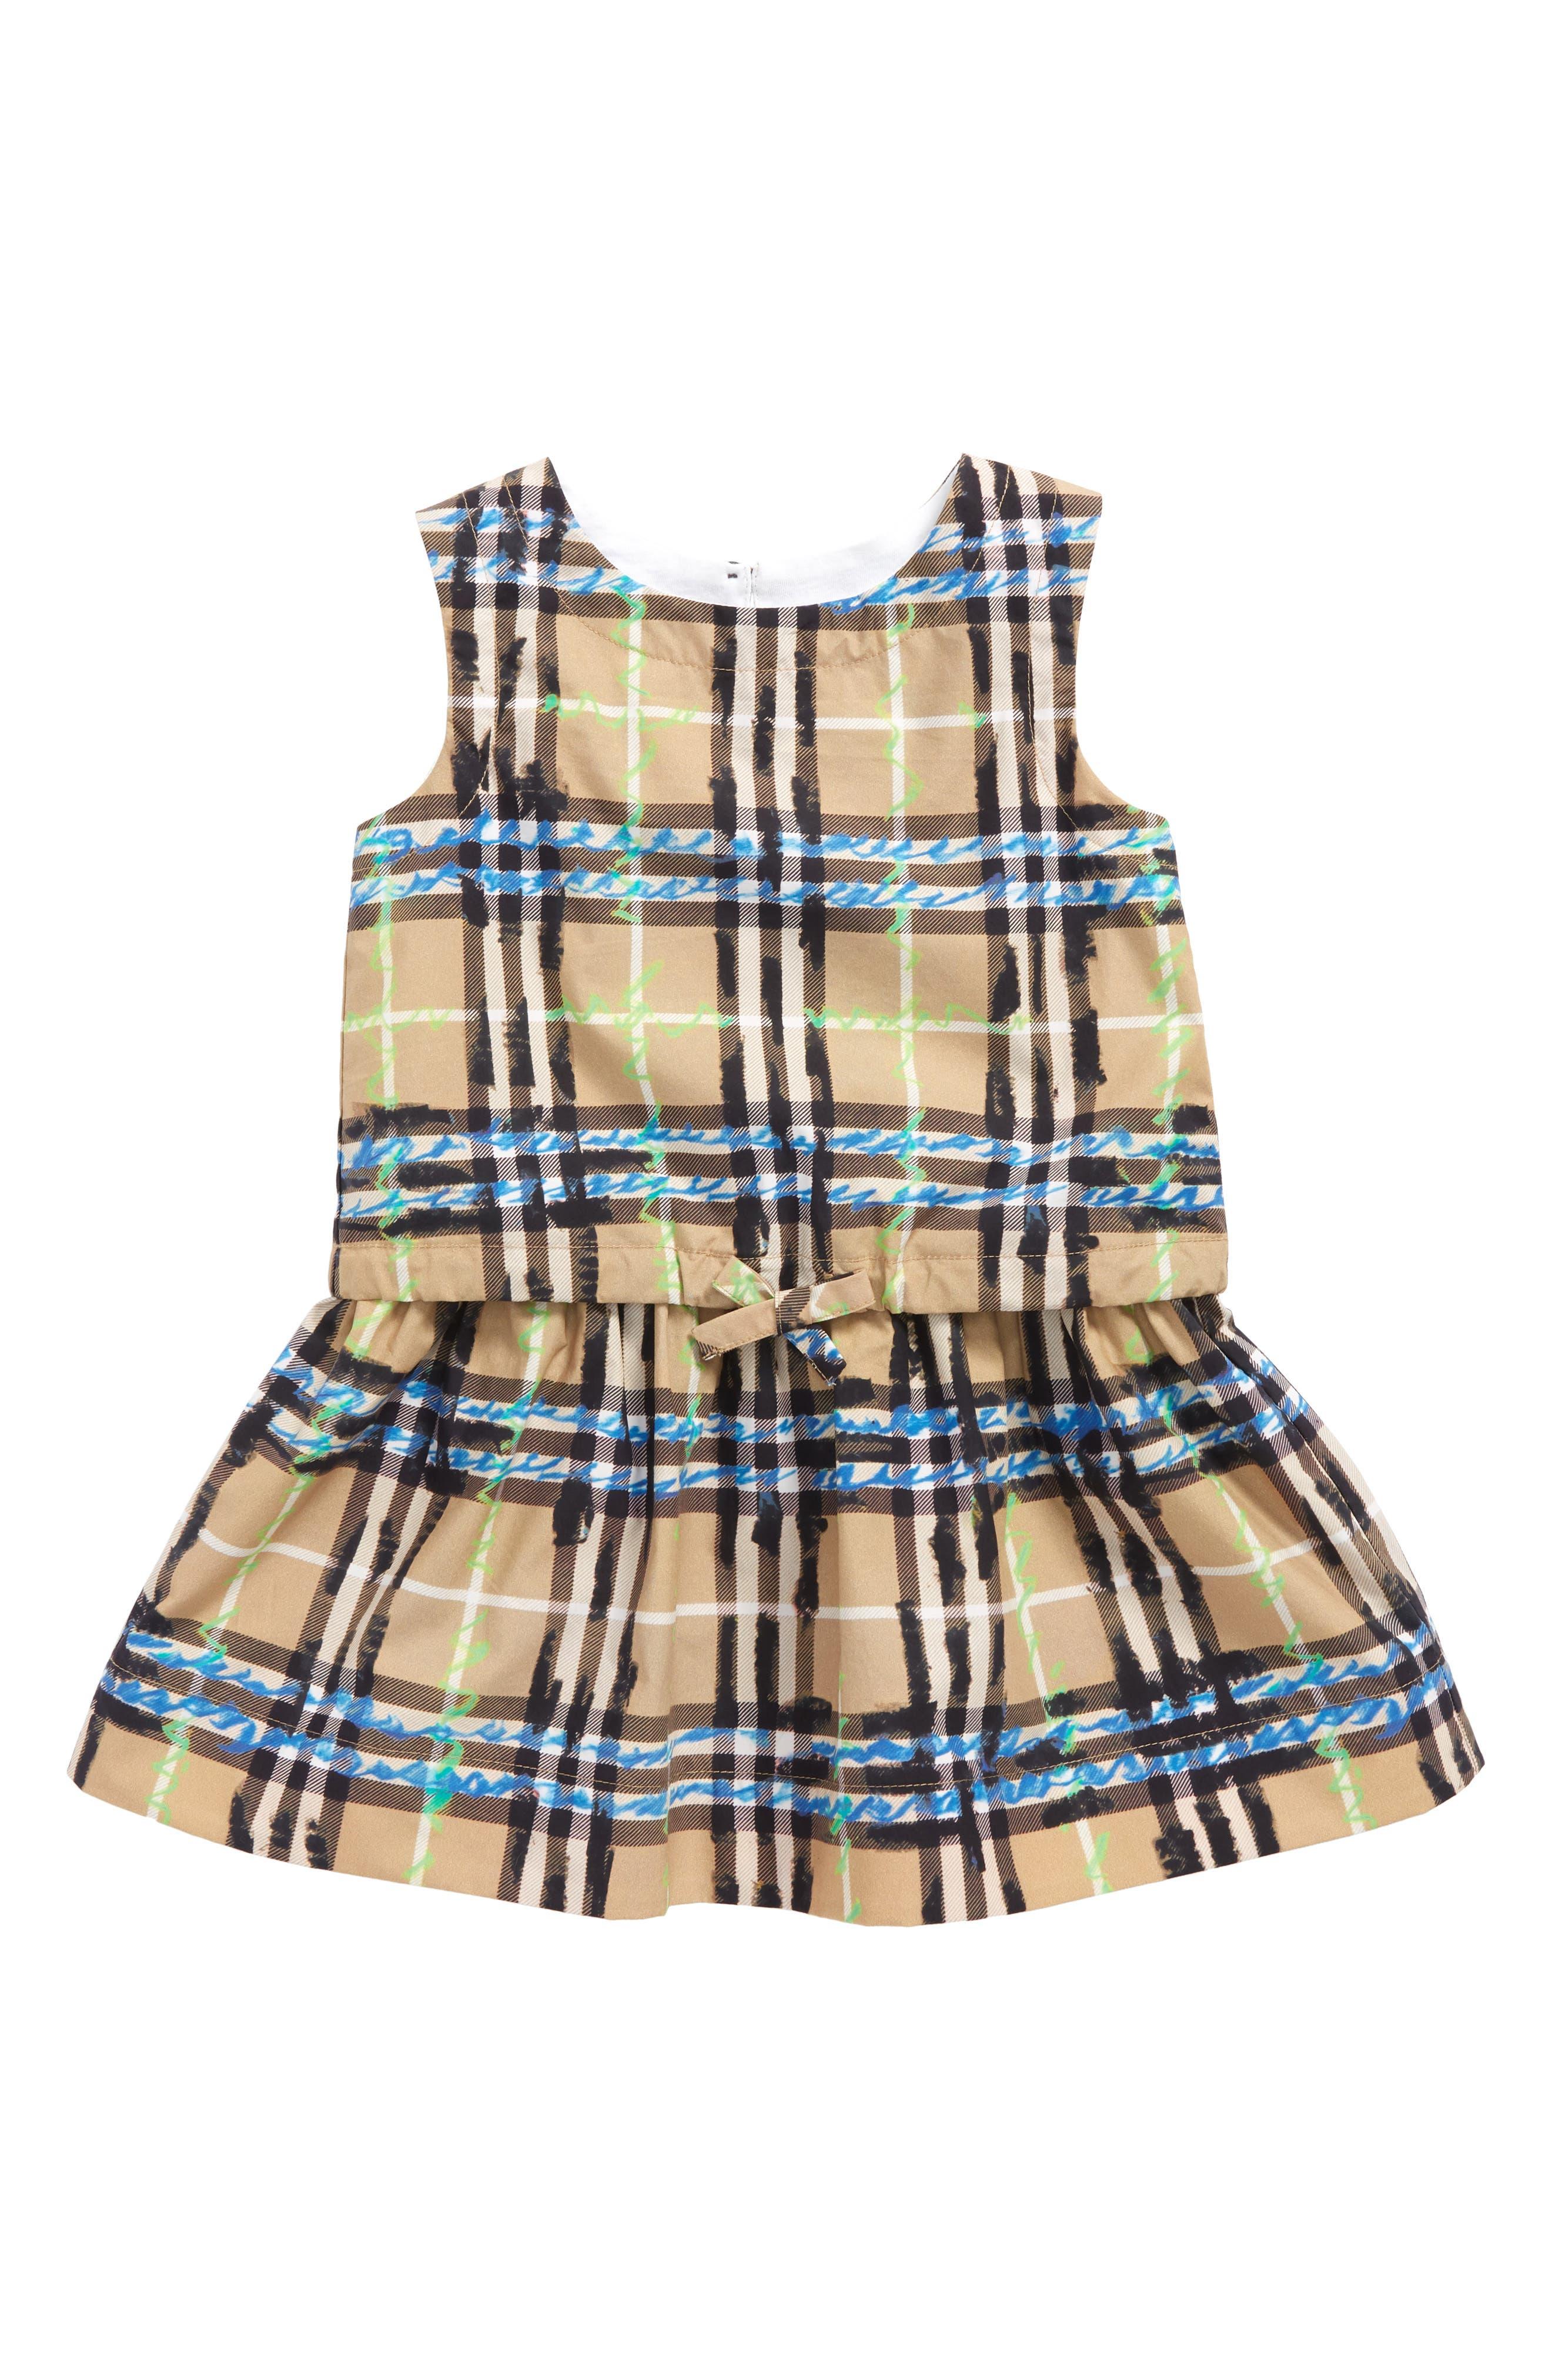 Mabel Check Dress,                         Main,                         color, Bright Blue